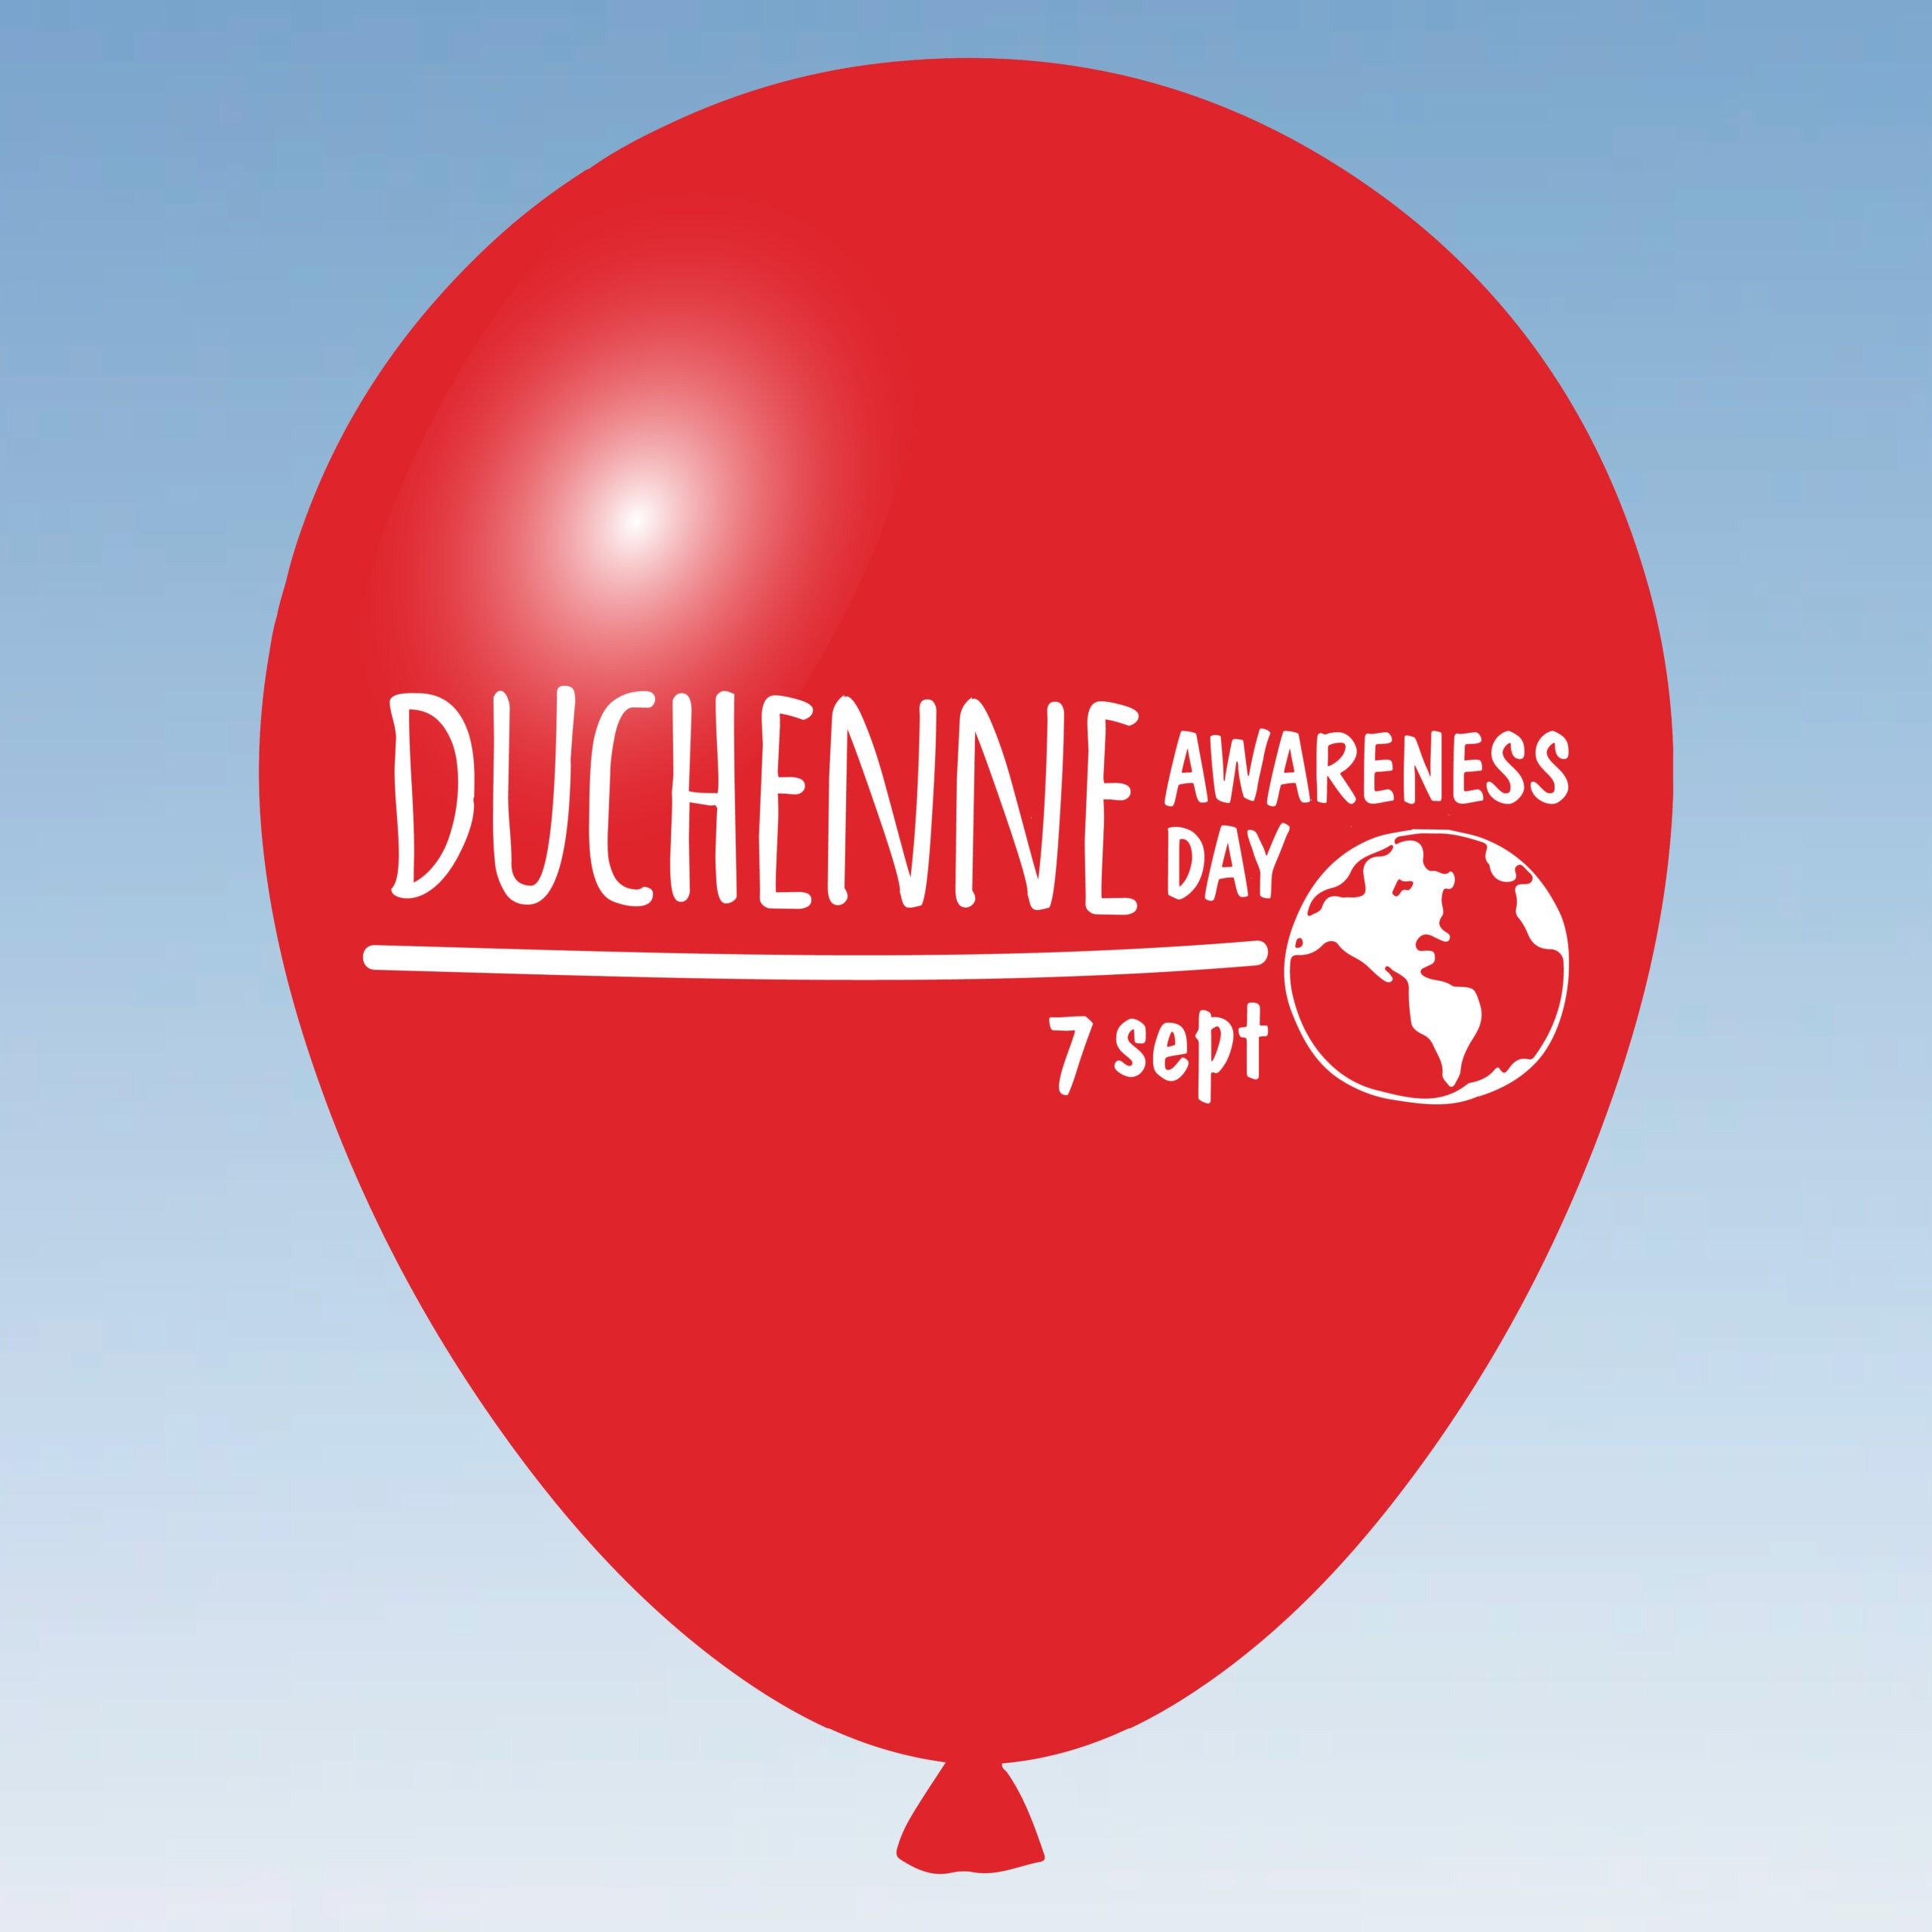 World Duchenne Awareness Day balloon